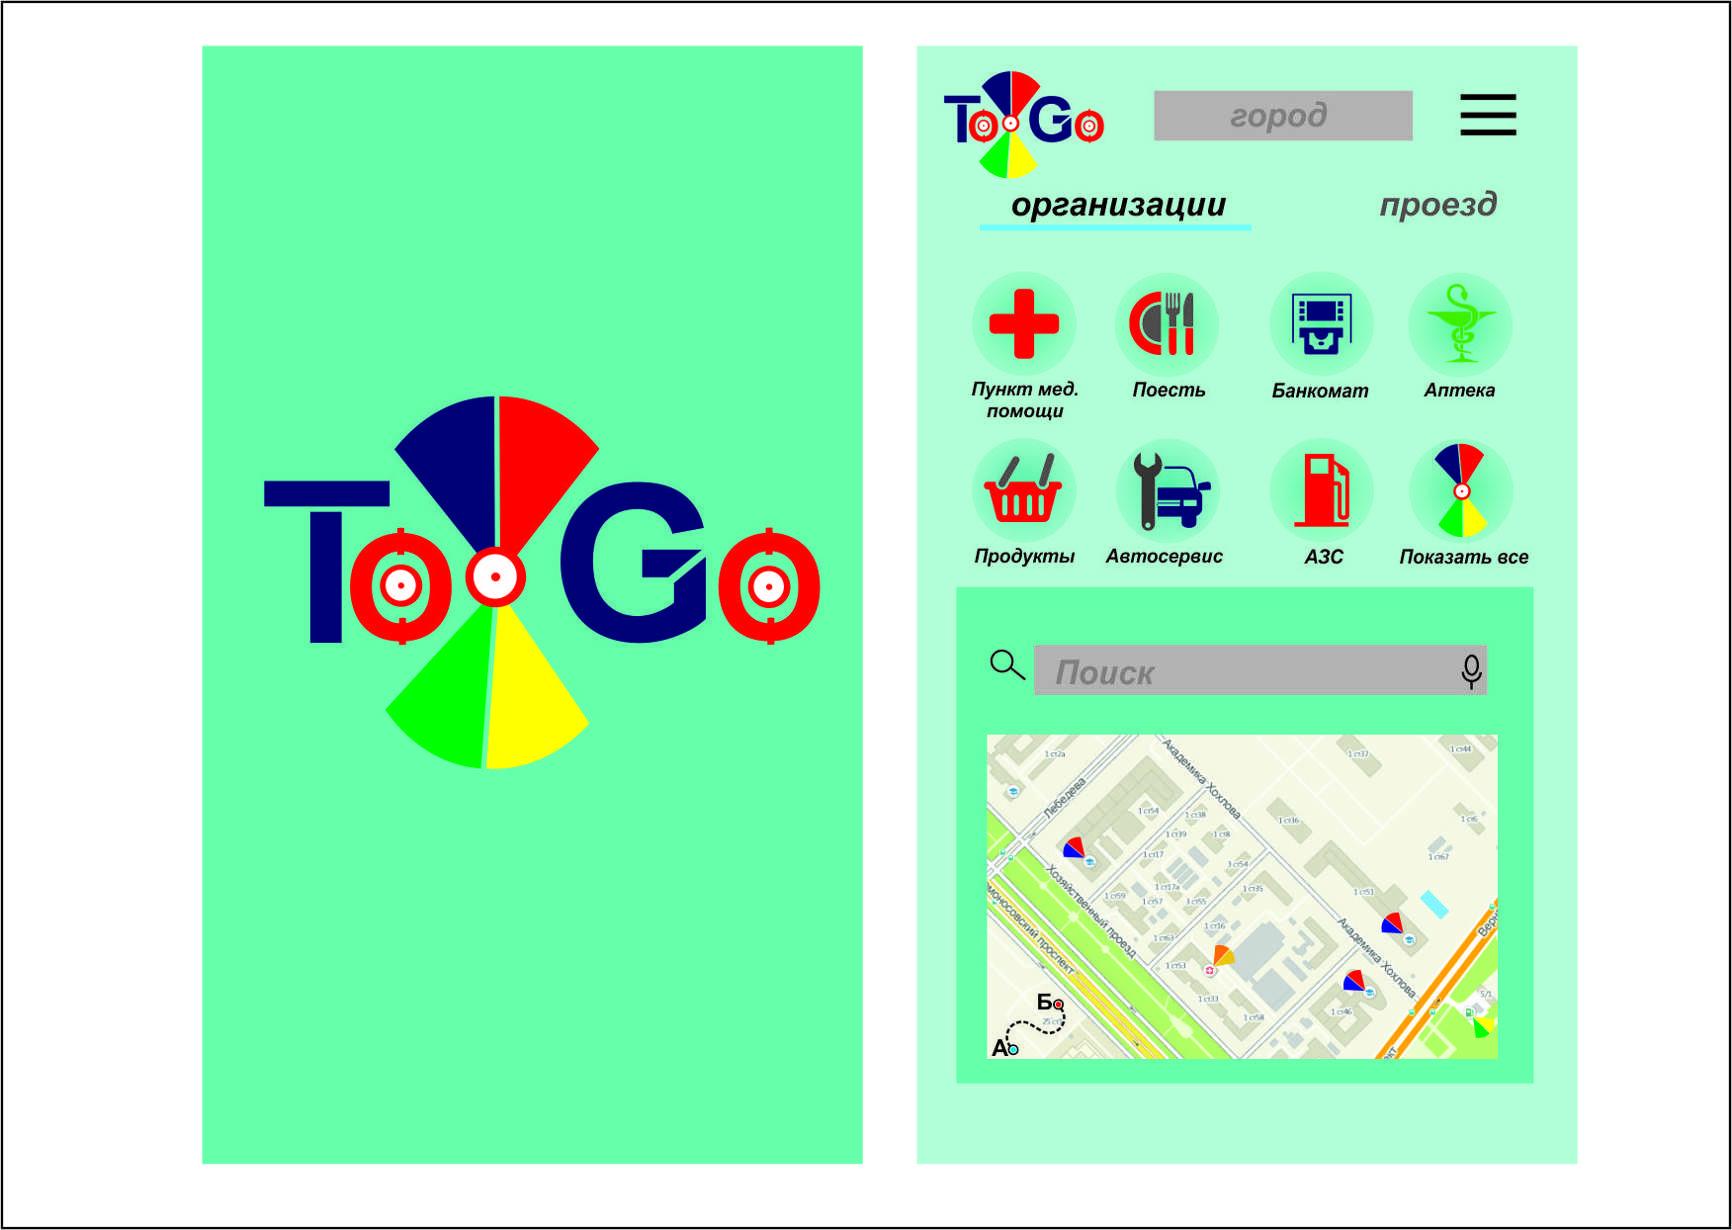 Разработать логотип и экран загрузки приложения фото f_7675a8bbec33b423.jpg